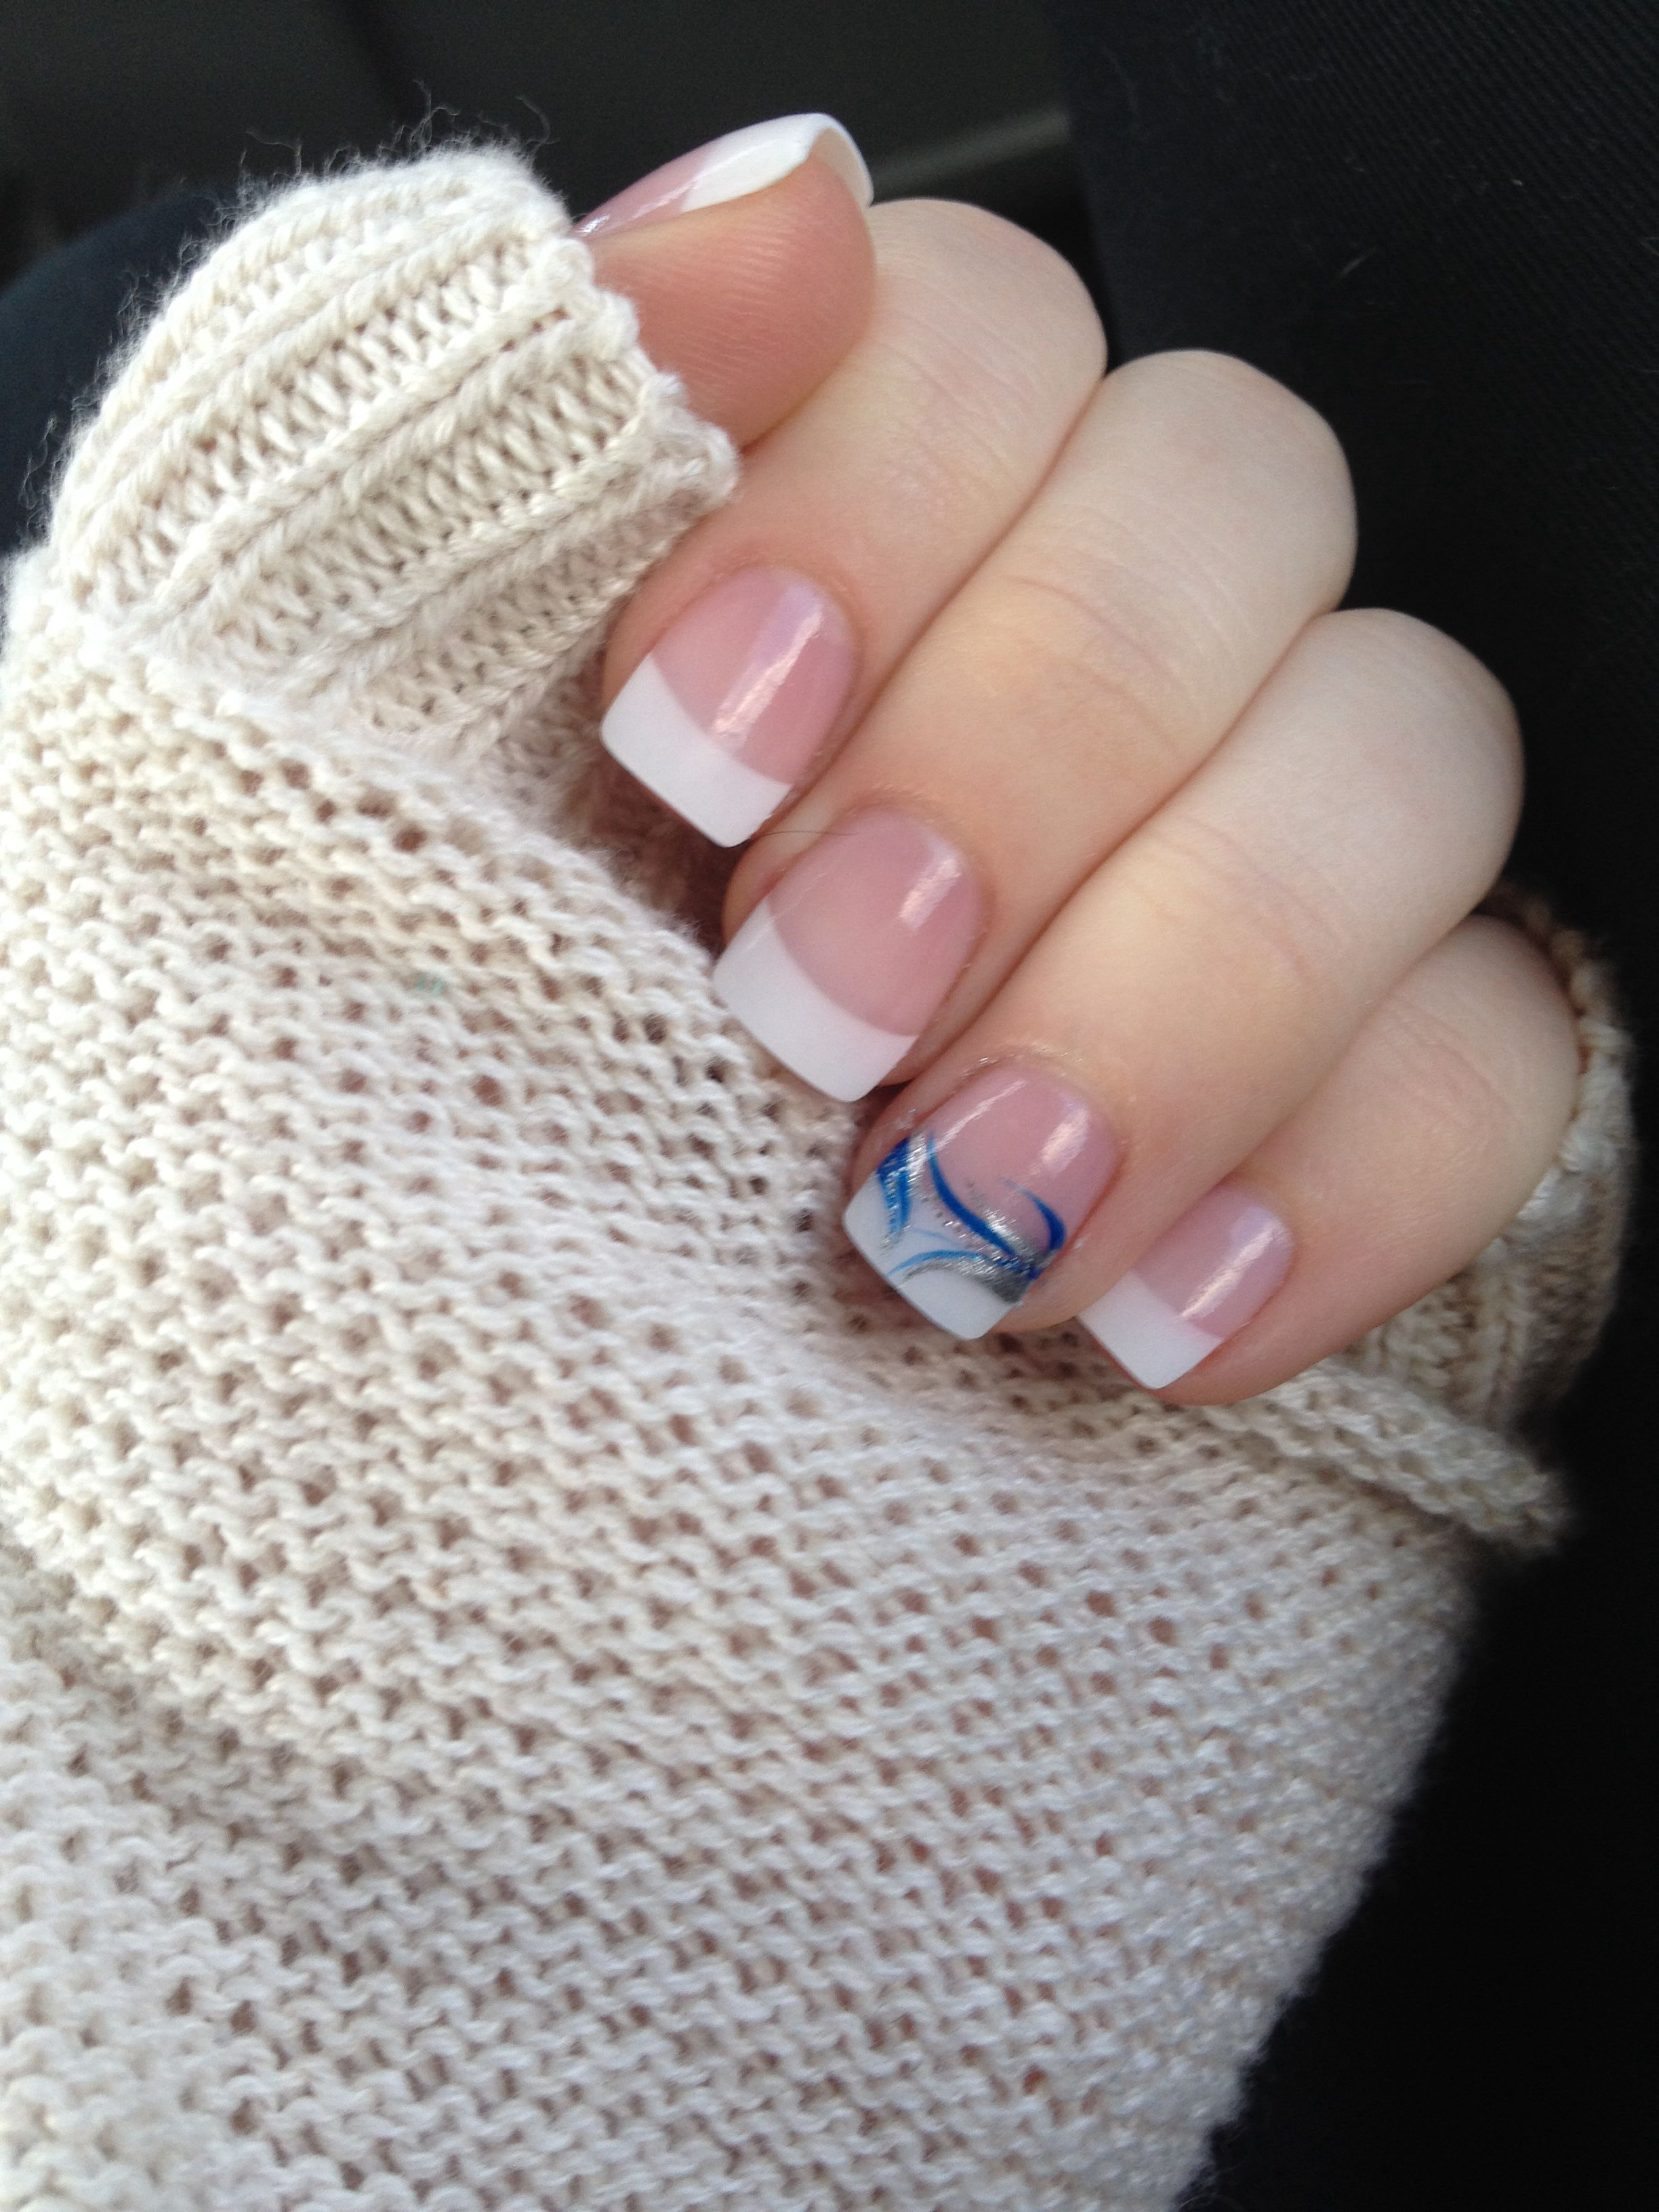 Acrylic nails for prom | Short Nail Designs | Pinterest | Acrylics ...